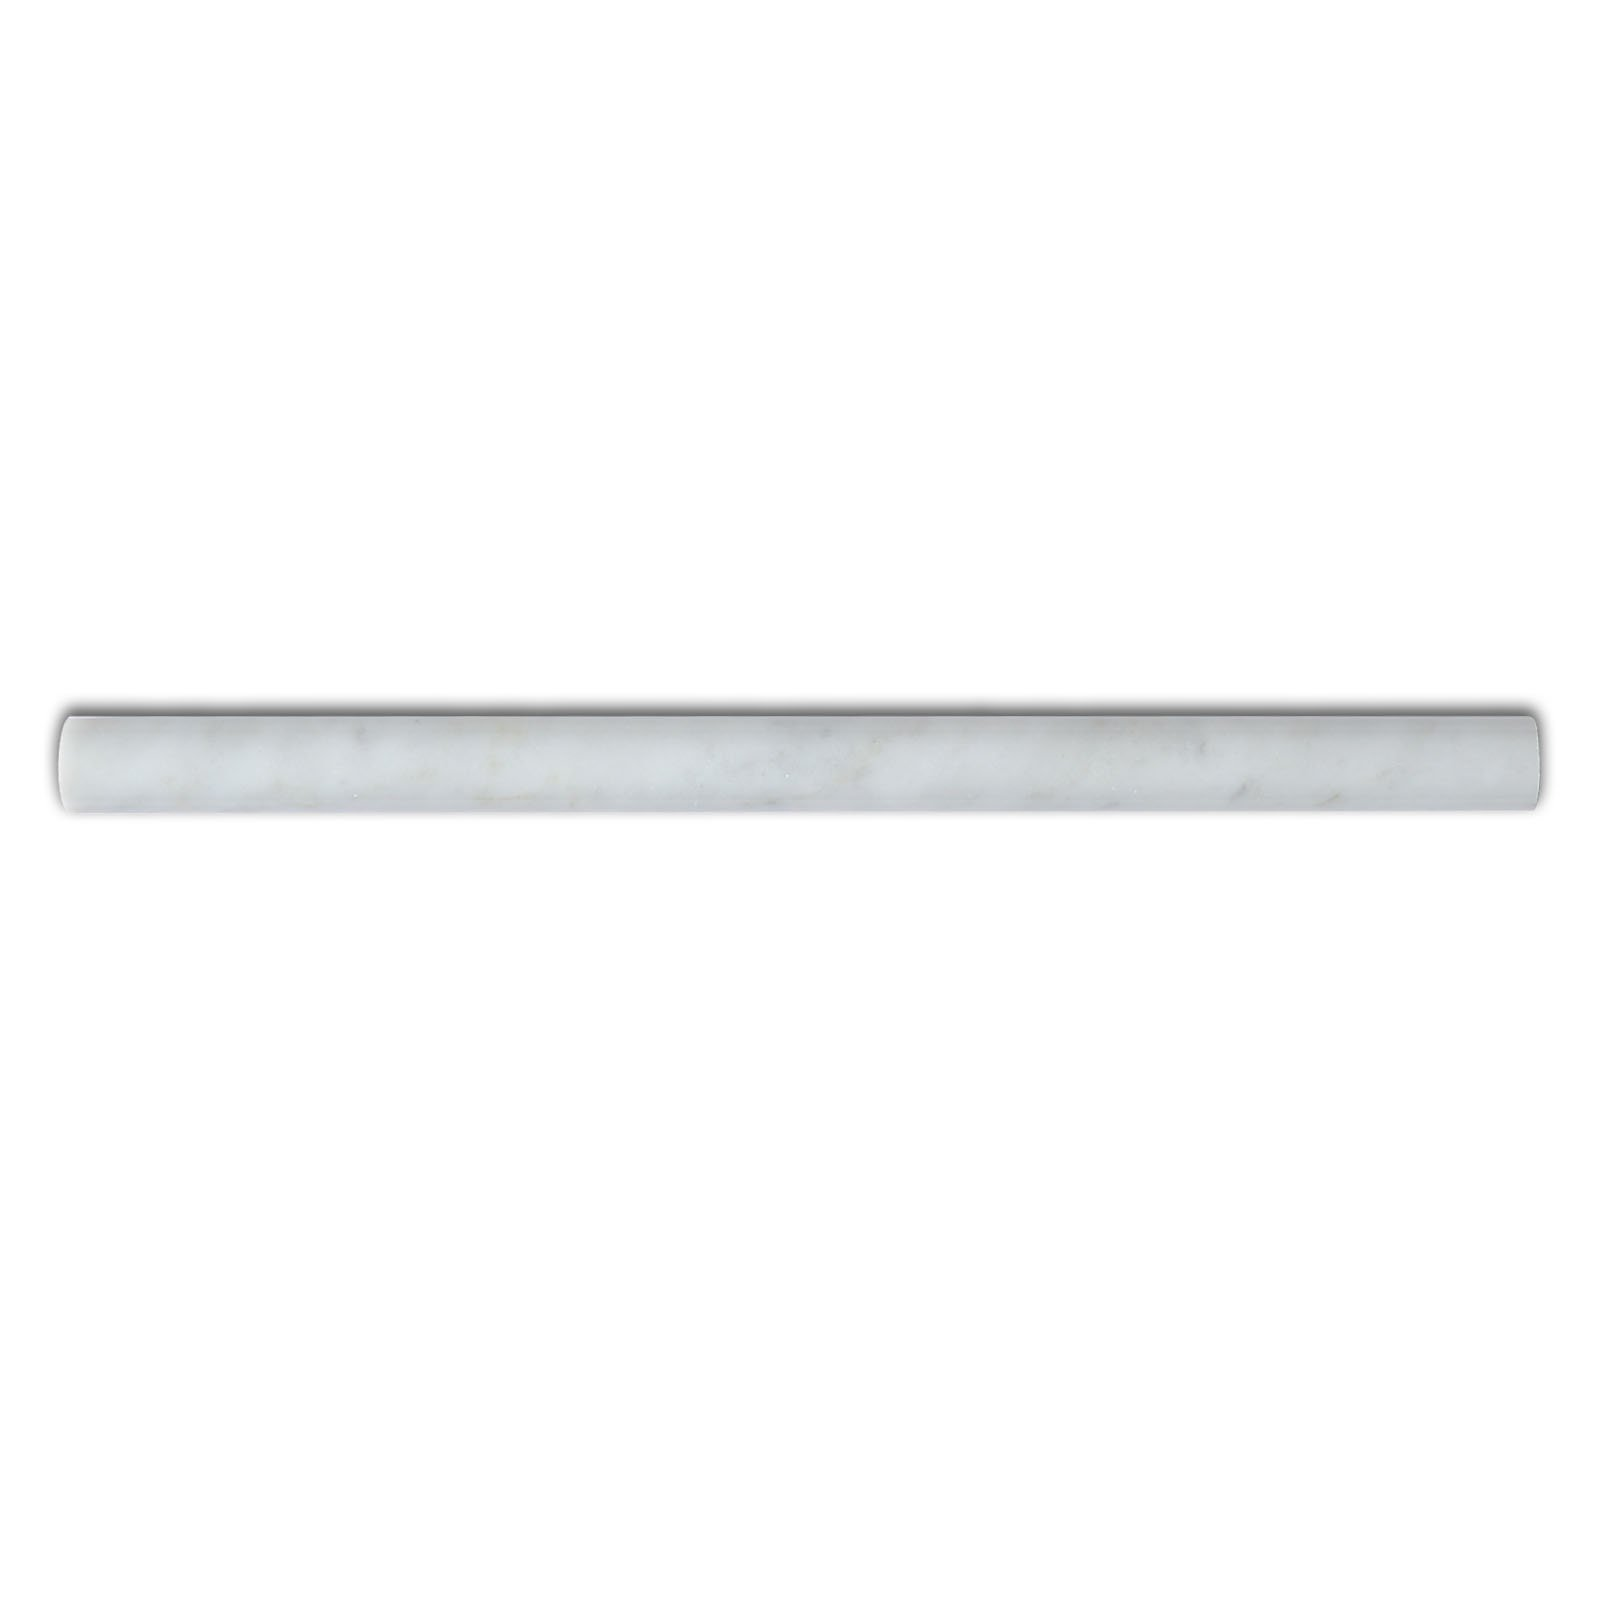 Carrara White Marble Moulding, CWMT34PEN, 12''X3/4''X3/4'' Pencil, Polished (Lot of 40 Pieces)